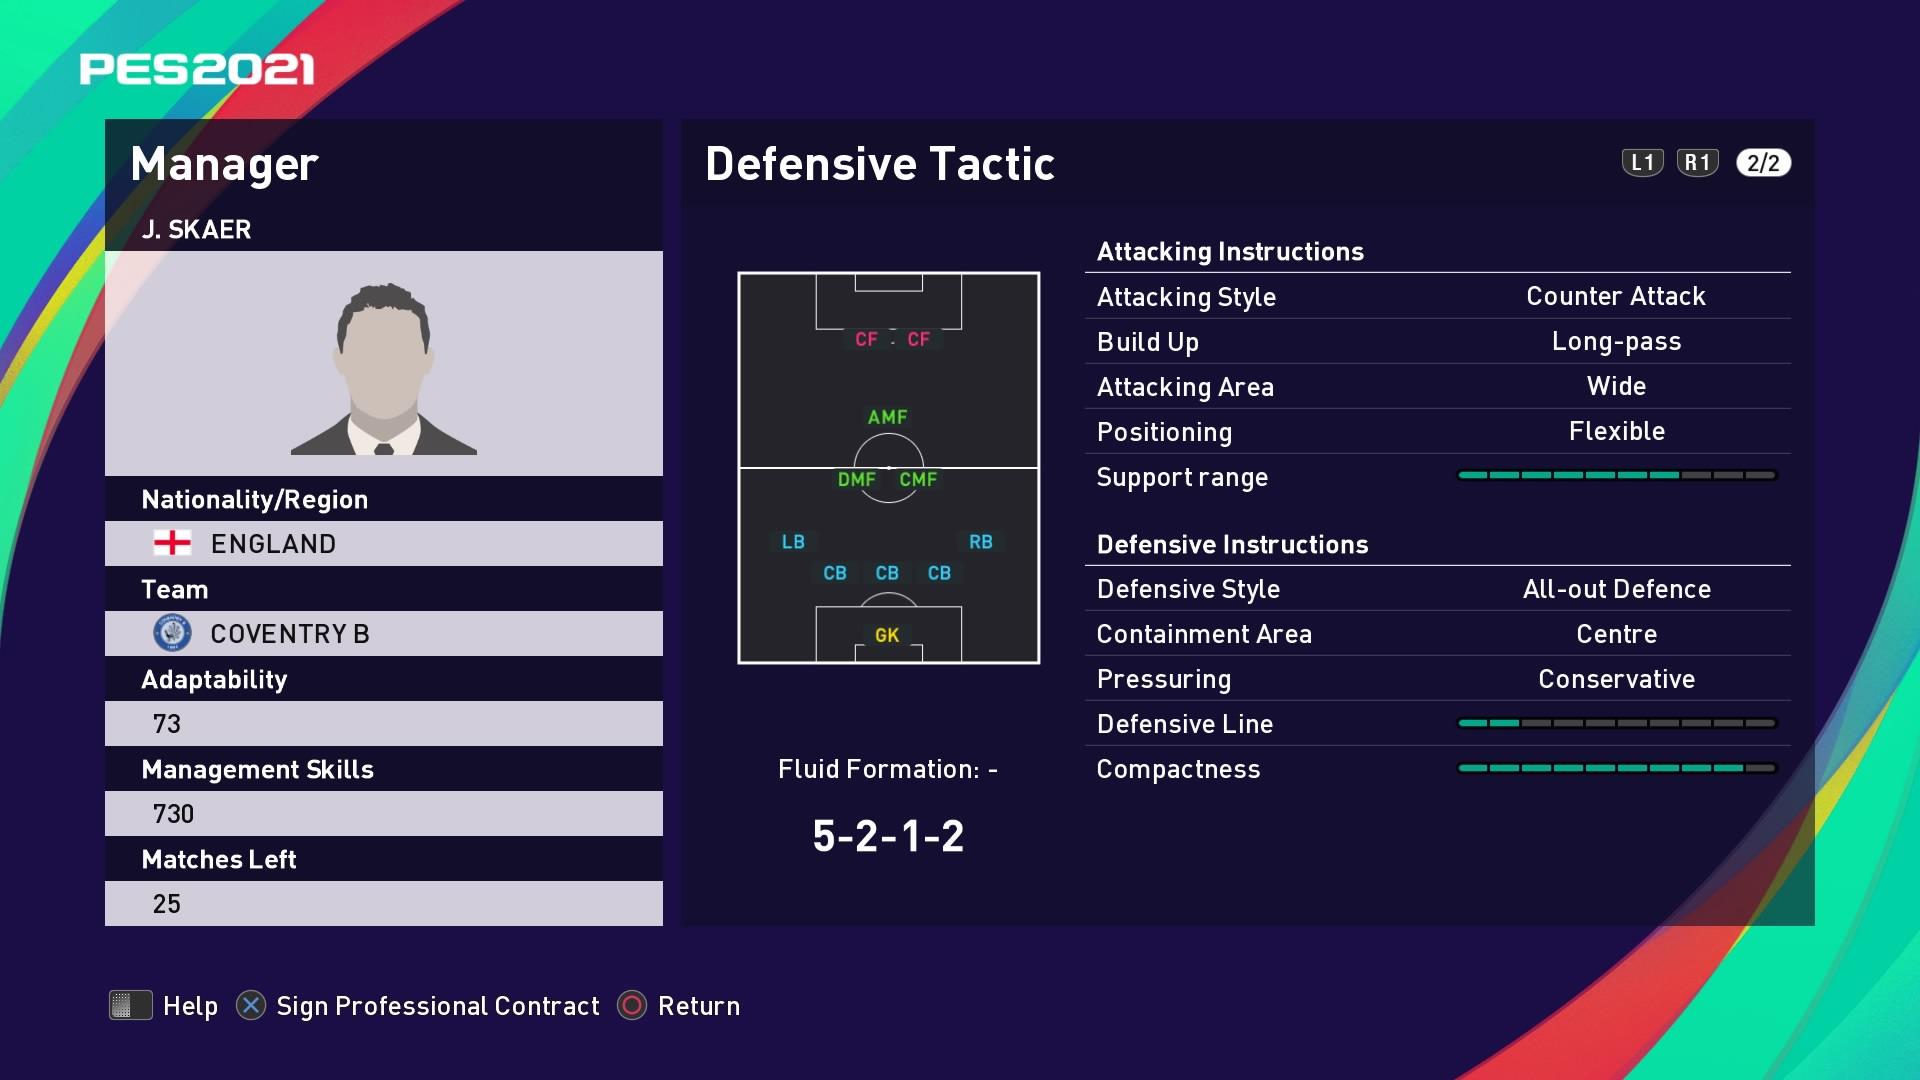 J. Skaer (2) (Mark Robins) Defensive Tactic in PES 2021 myClub